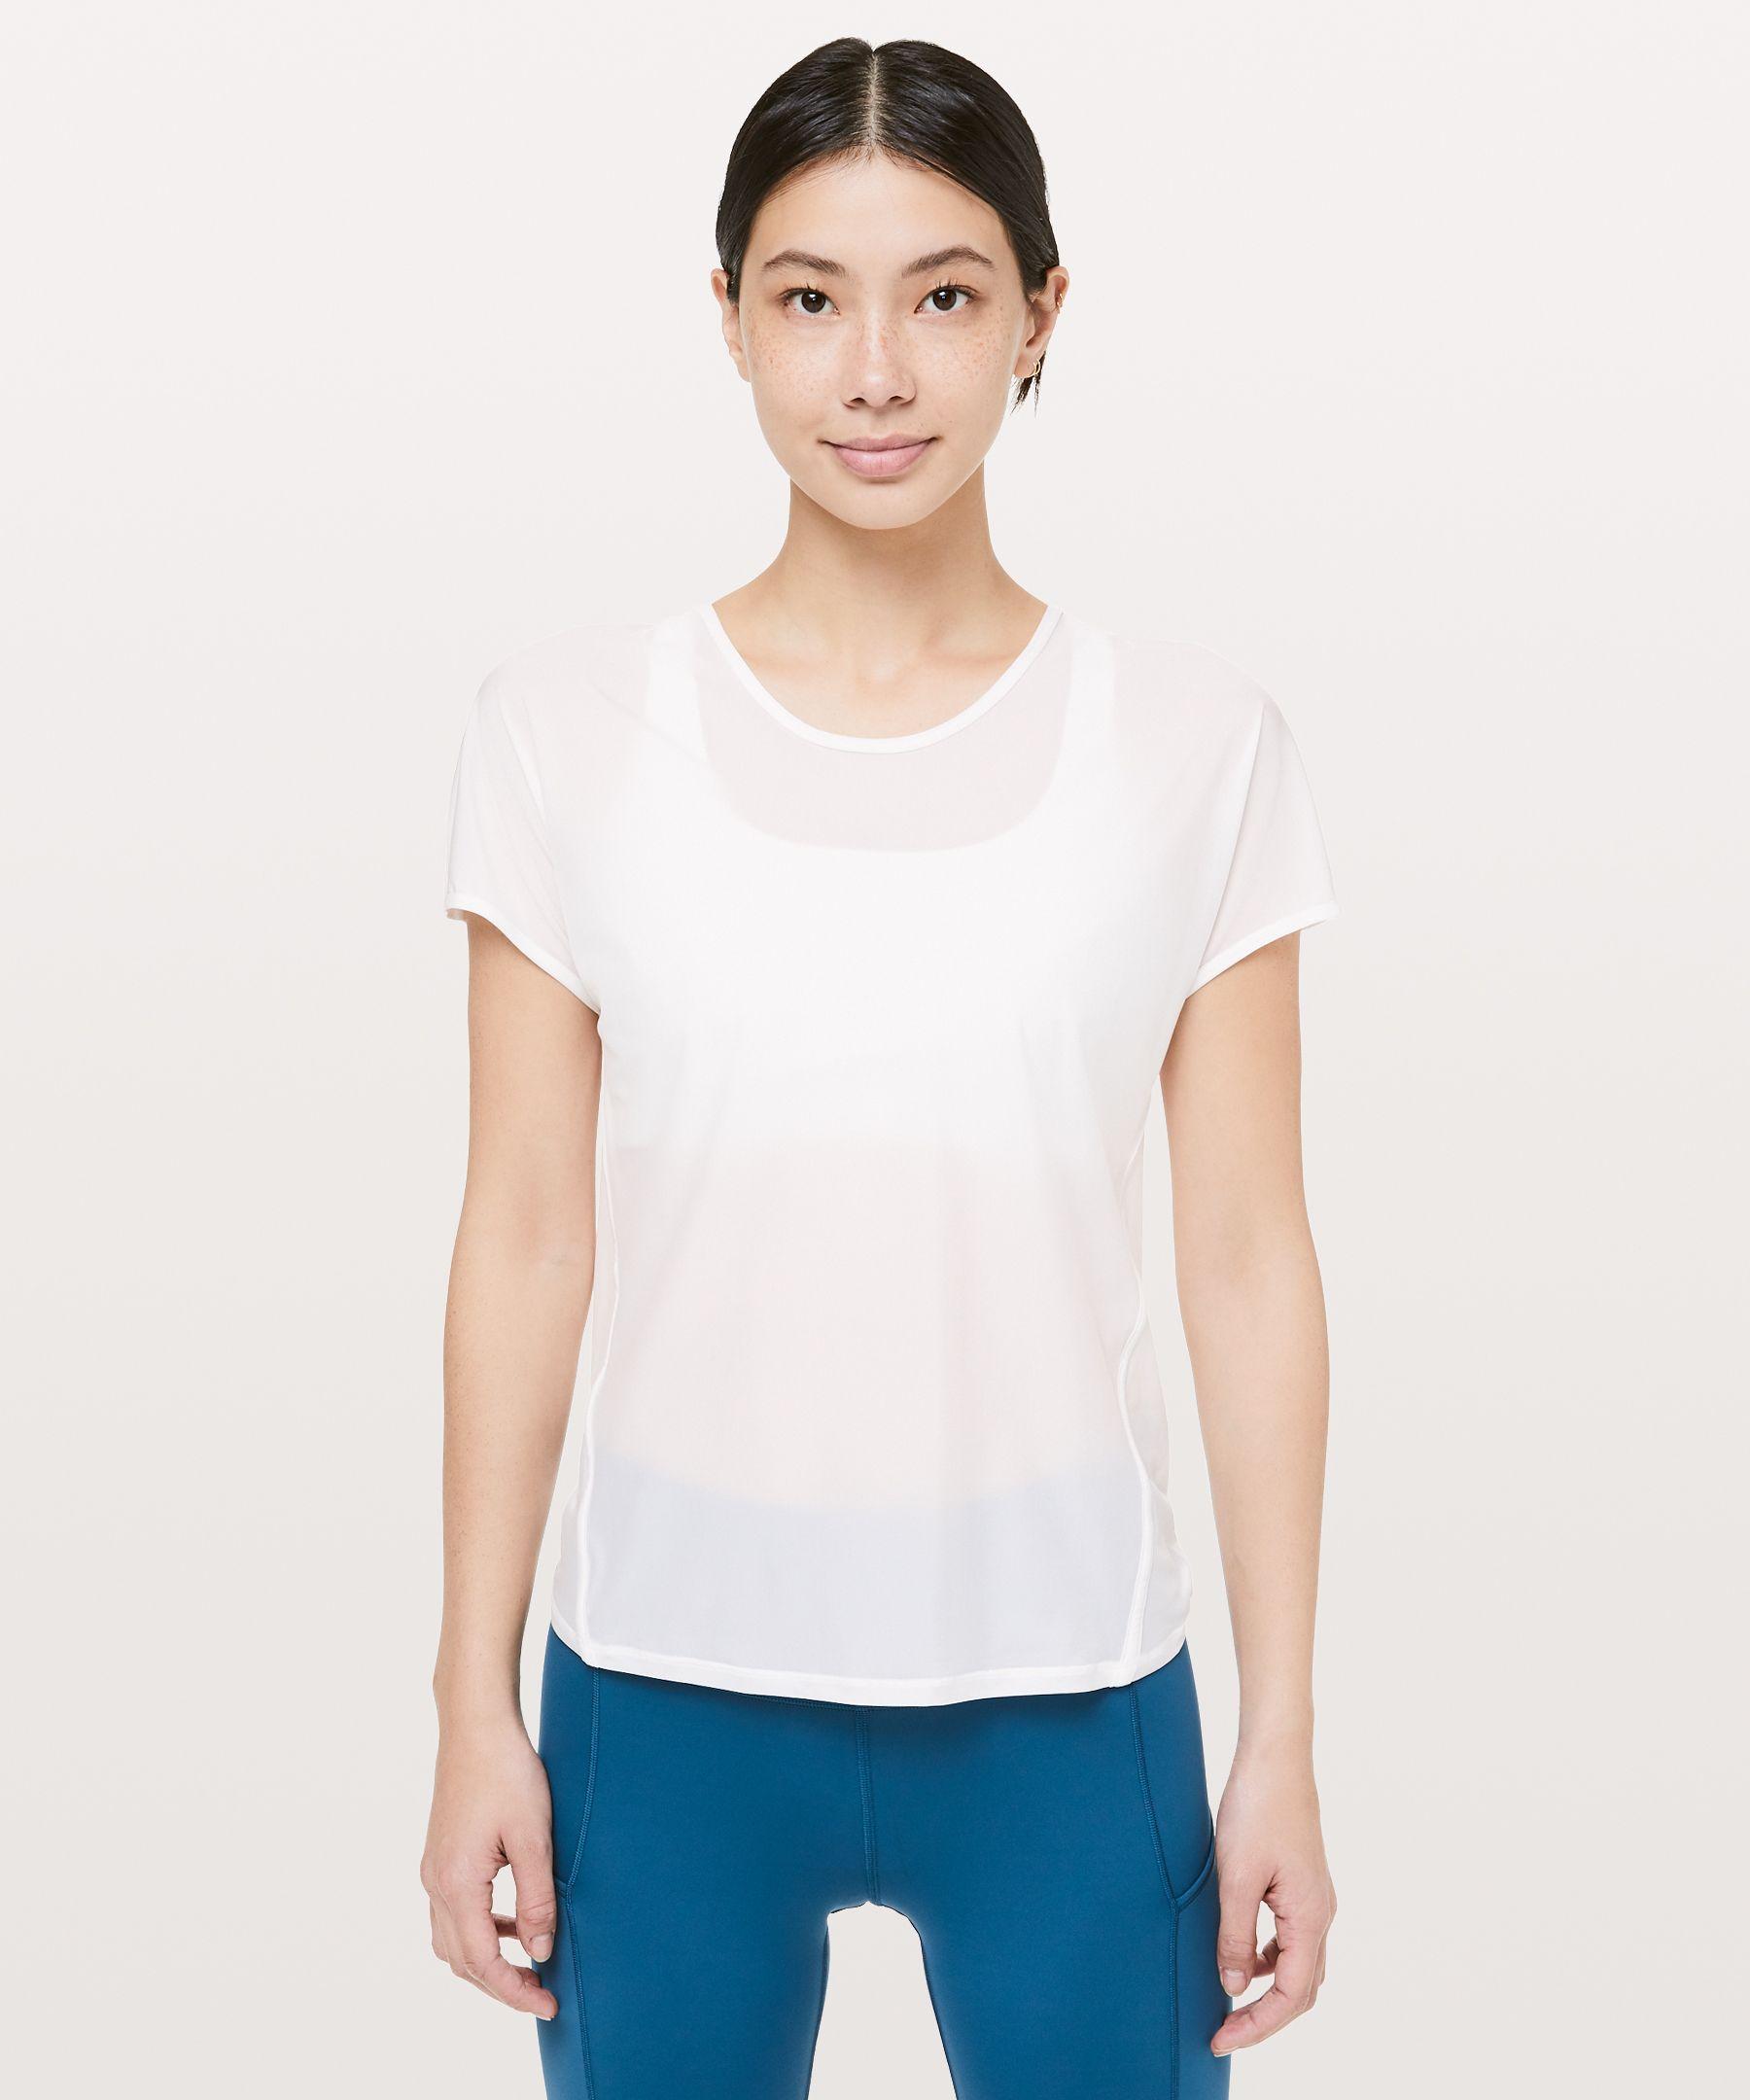 Twist & Train Short Sleeve by Lululemon